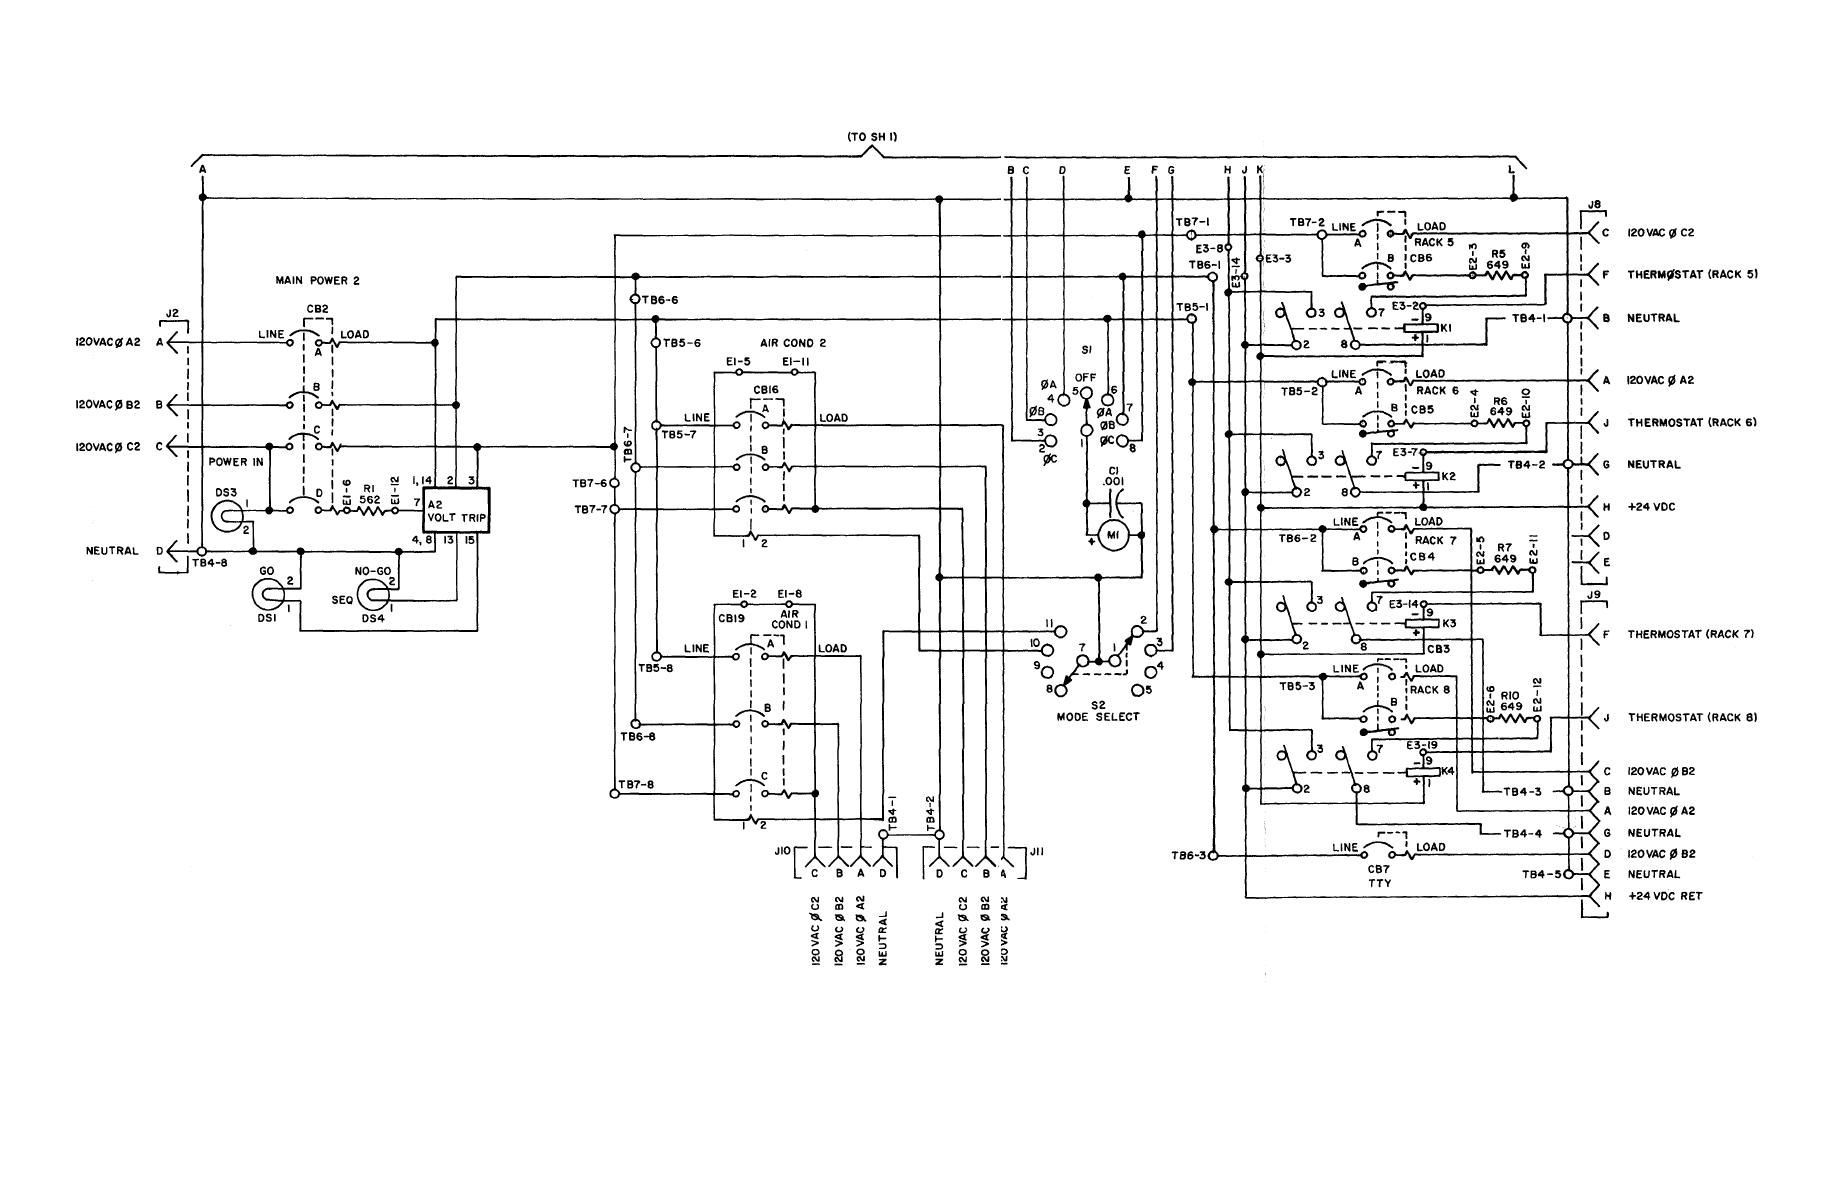 OT_6864] Distribution Panel Wiring Diagram Schematic WiringNorab Wiluq Sequ Xrenket Licuk Mohammedshrine Librar Wiring 101